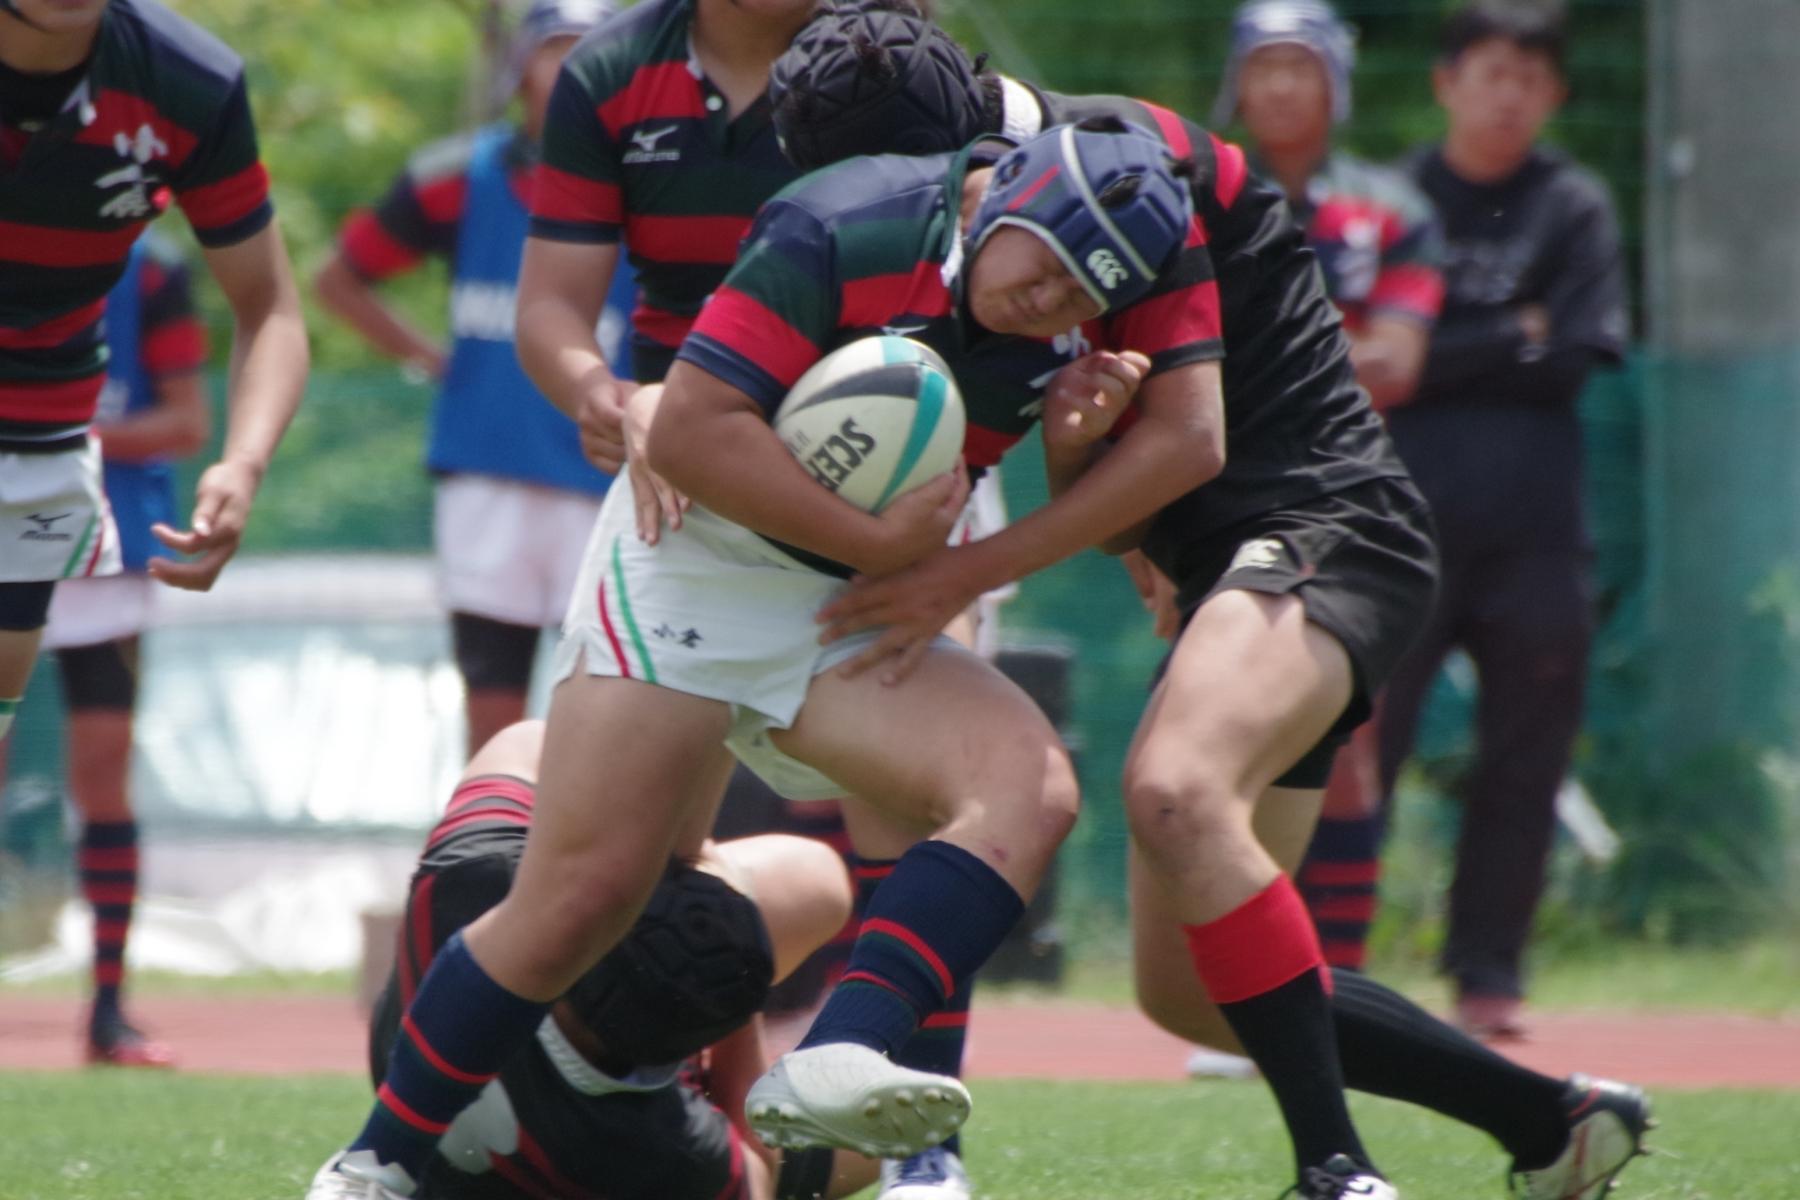 http://kokura-rugby.sakura.ne.jp/180520_132510_0757.jpg